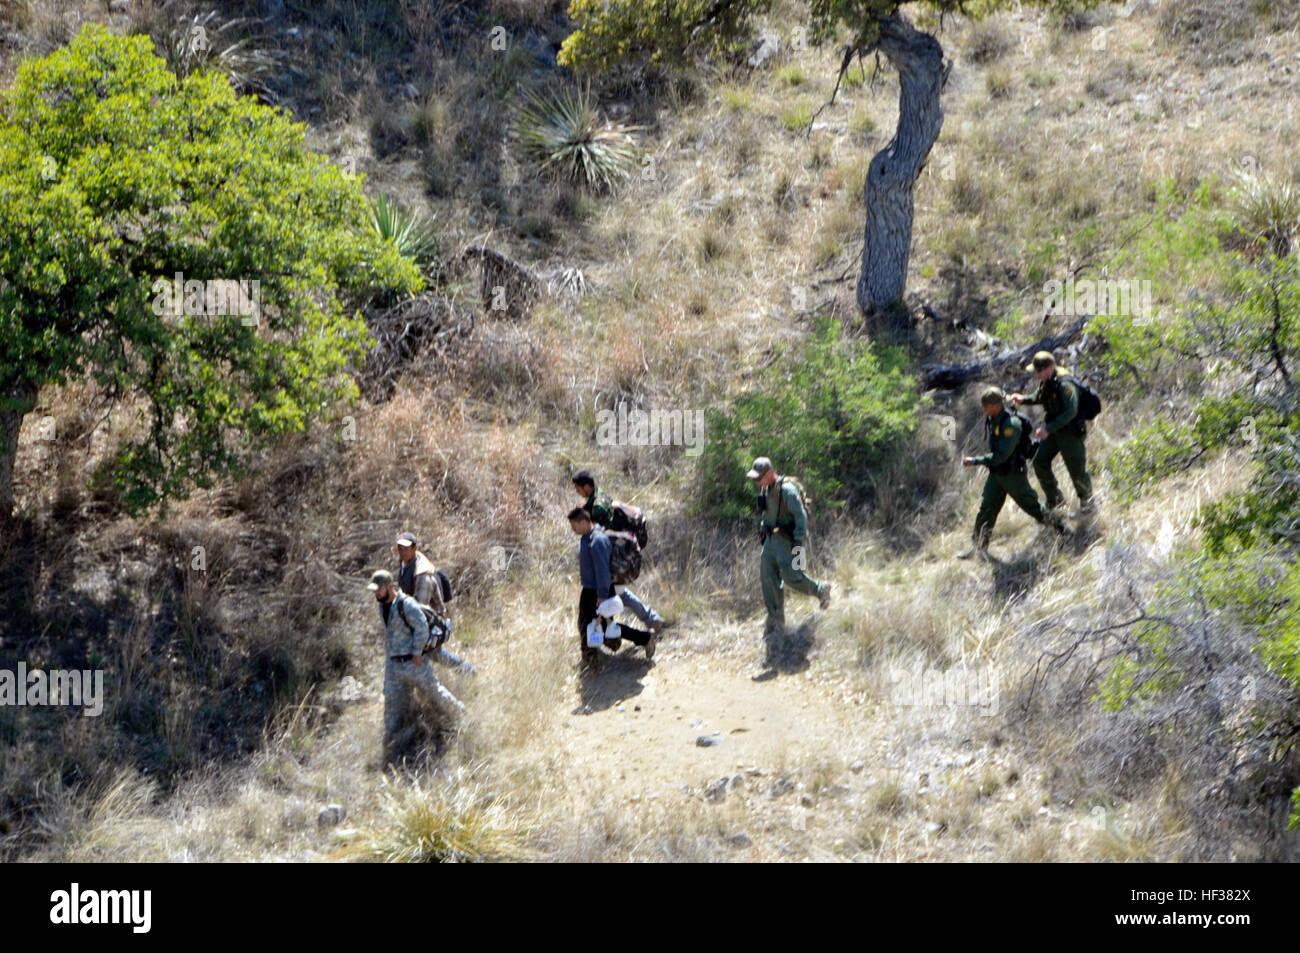 U.S. Border Patrol agents escort four undocumented immigrants captured near the U.S.-Mexico border on April 23, - Stock Image